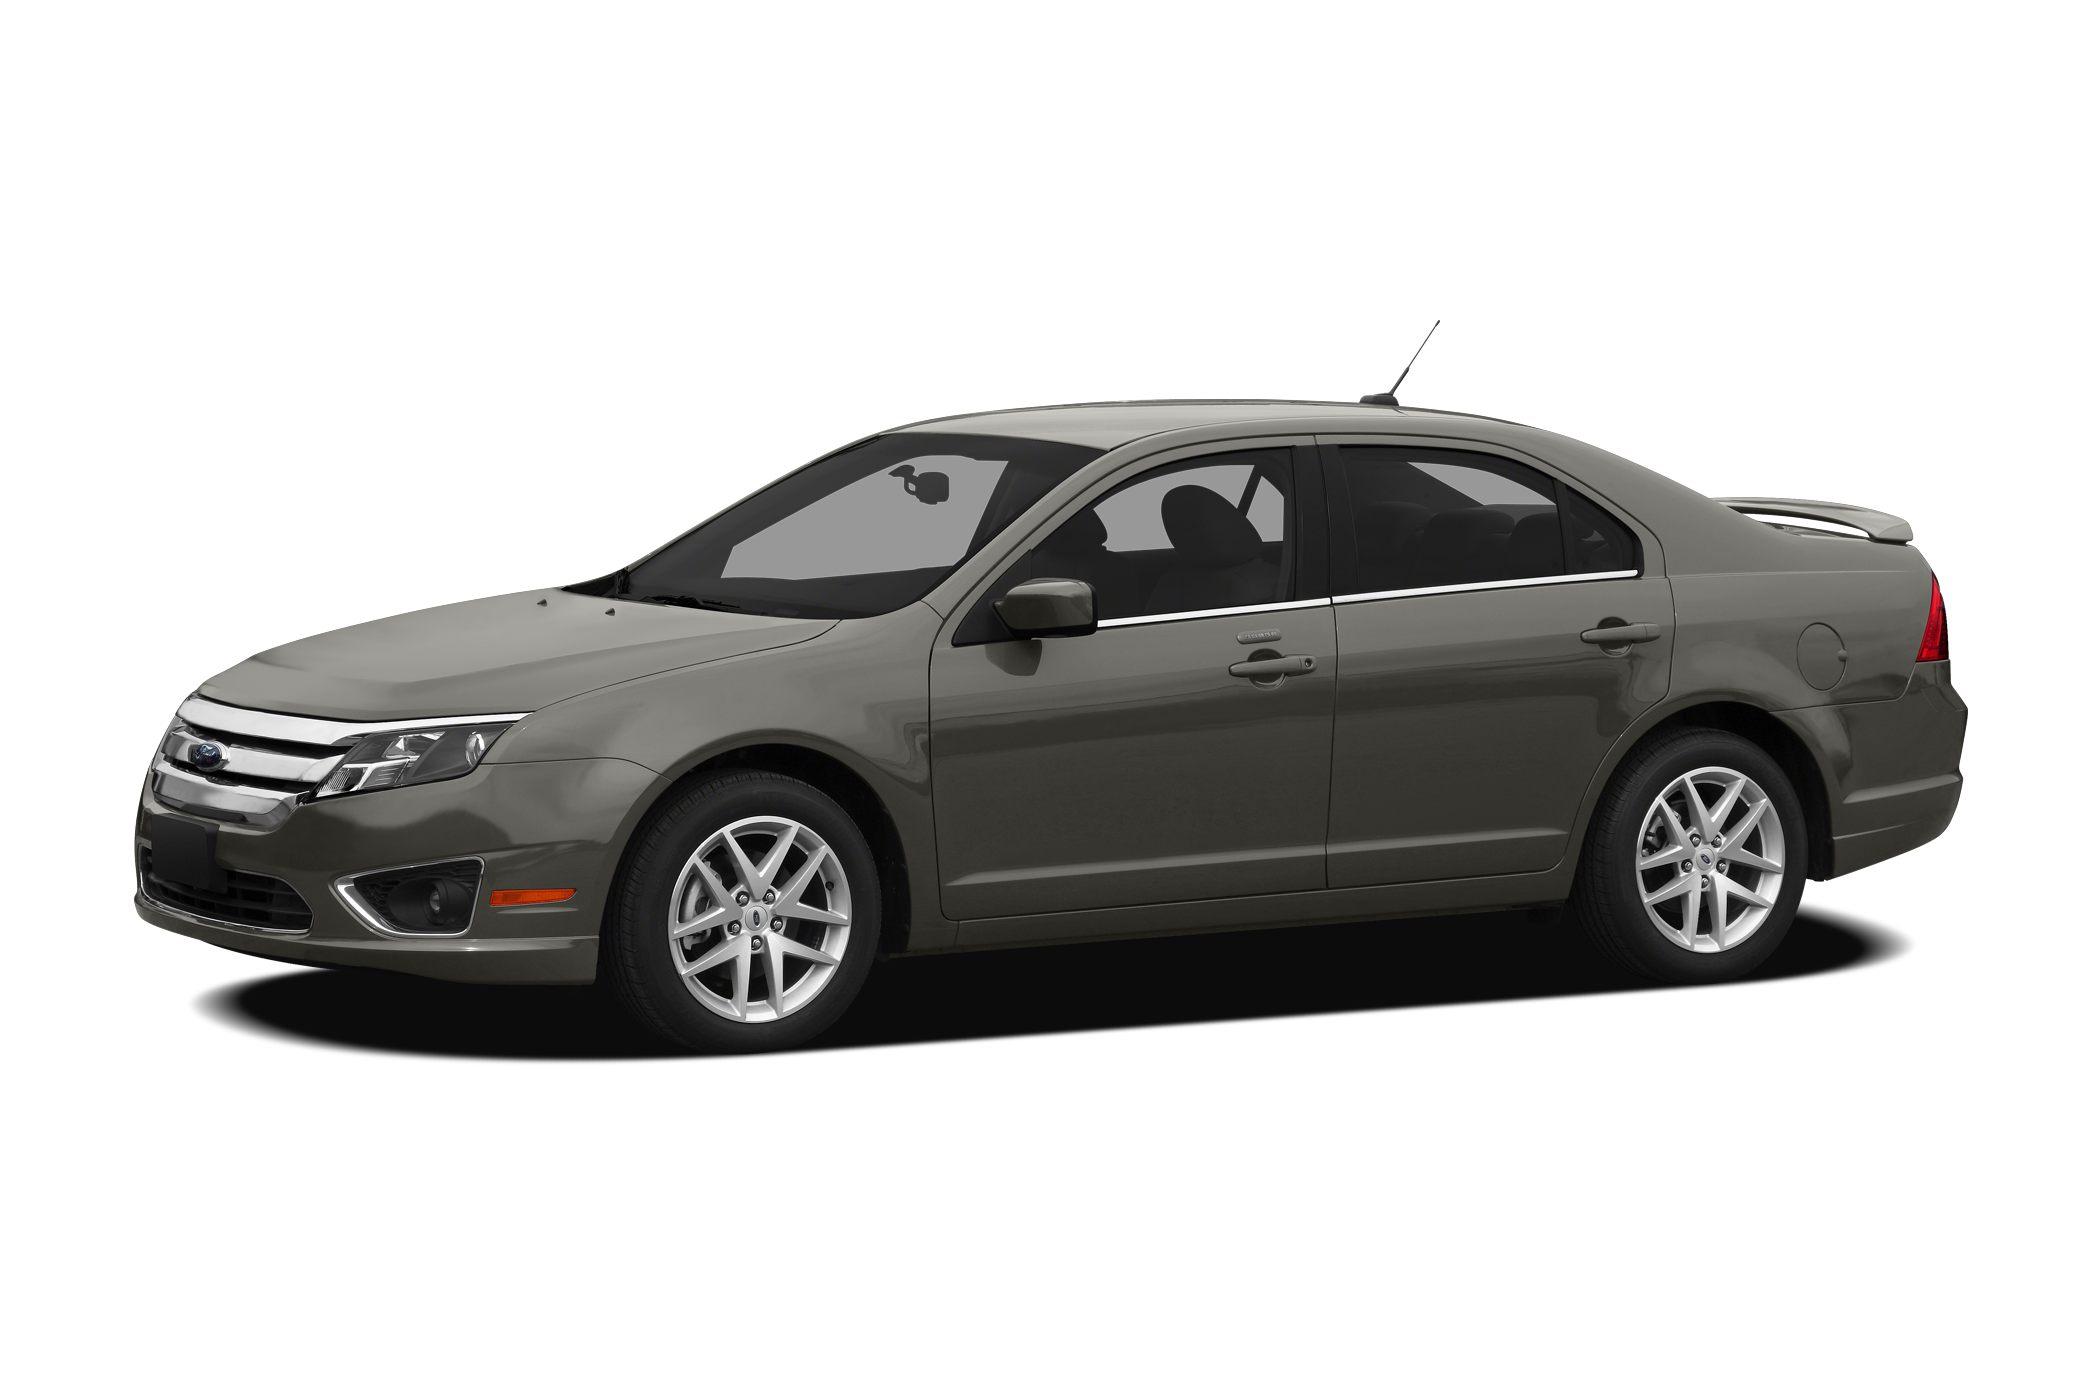 Grey Ford Fusion